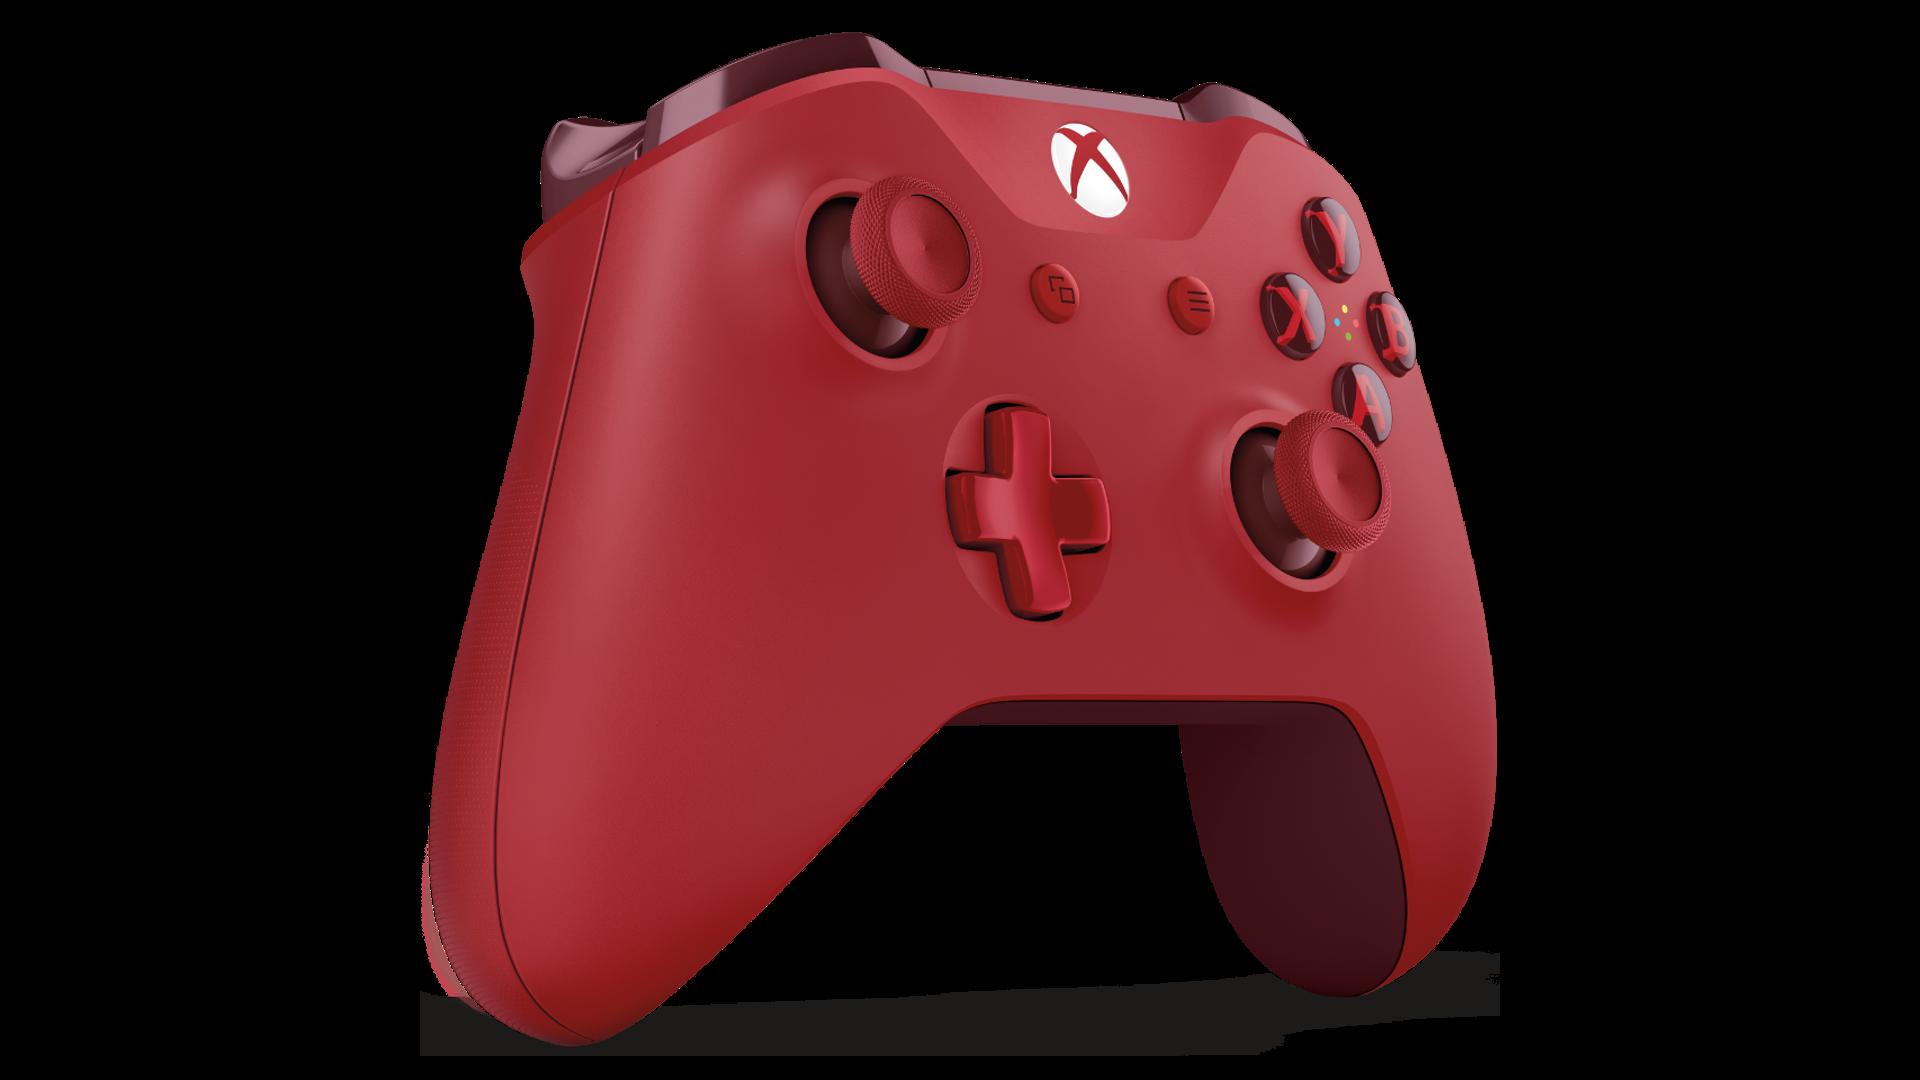 Xbox One Wireless Controller - Red   TheHut.com